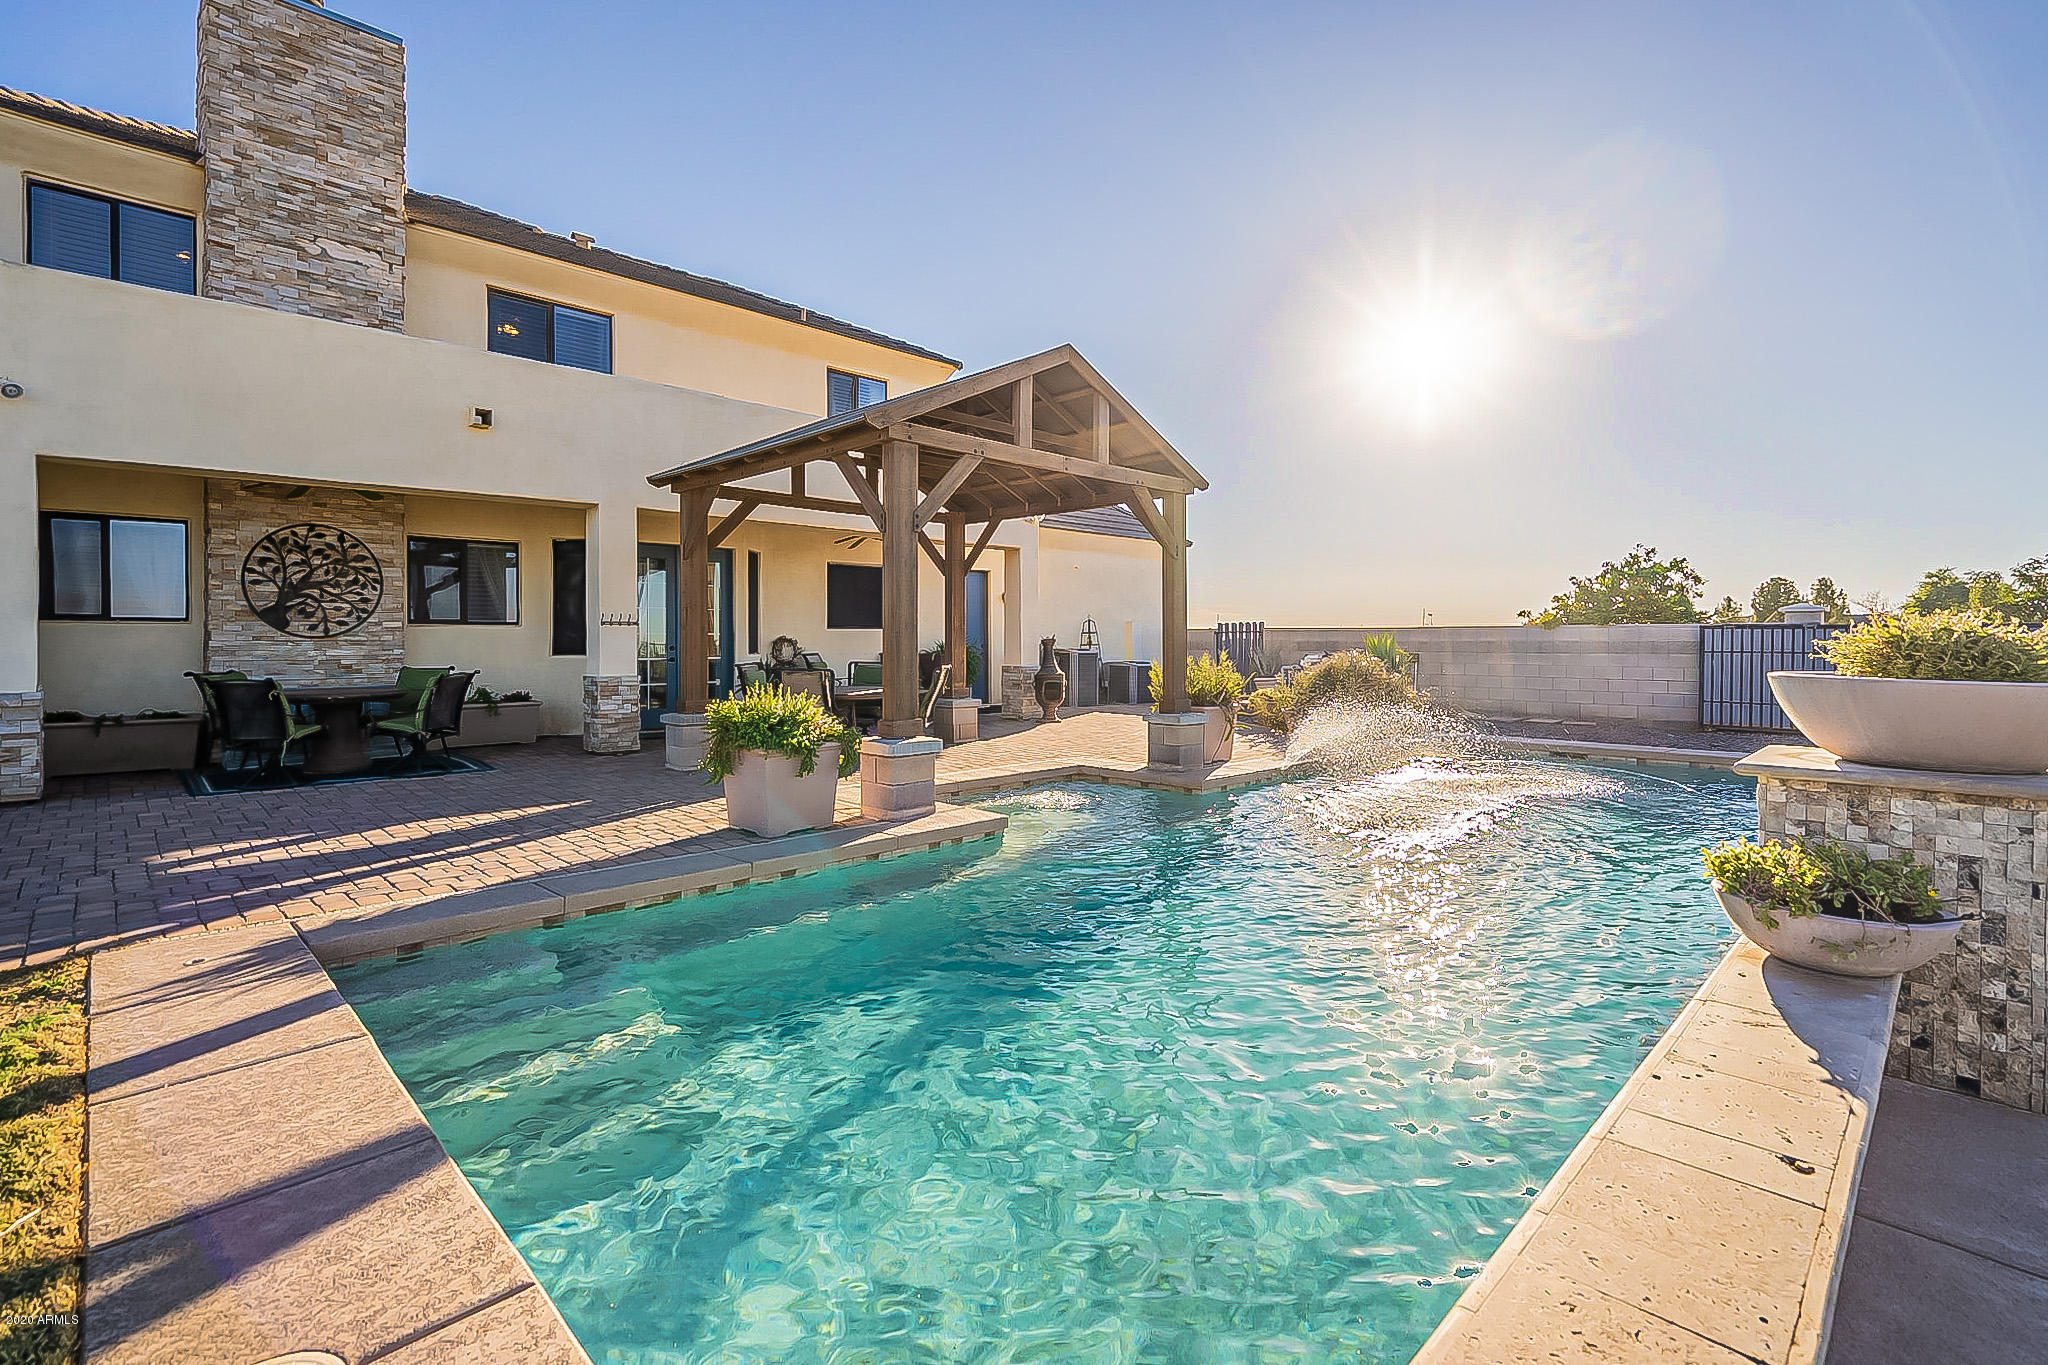 MLS 6147917 3770 E Graythorn Way, Coolidge, AZ 85128 Coolidge AZ Homes 10,000 Plus SqFt Lot